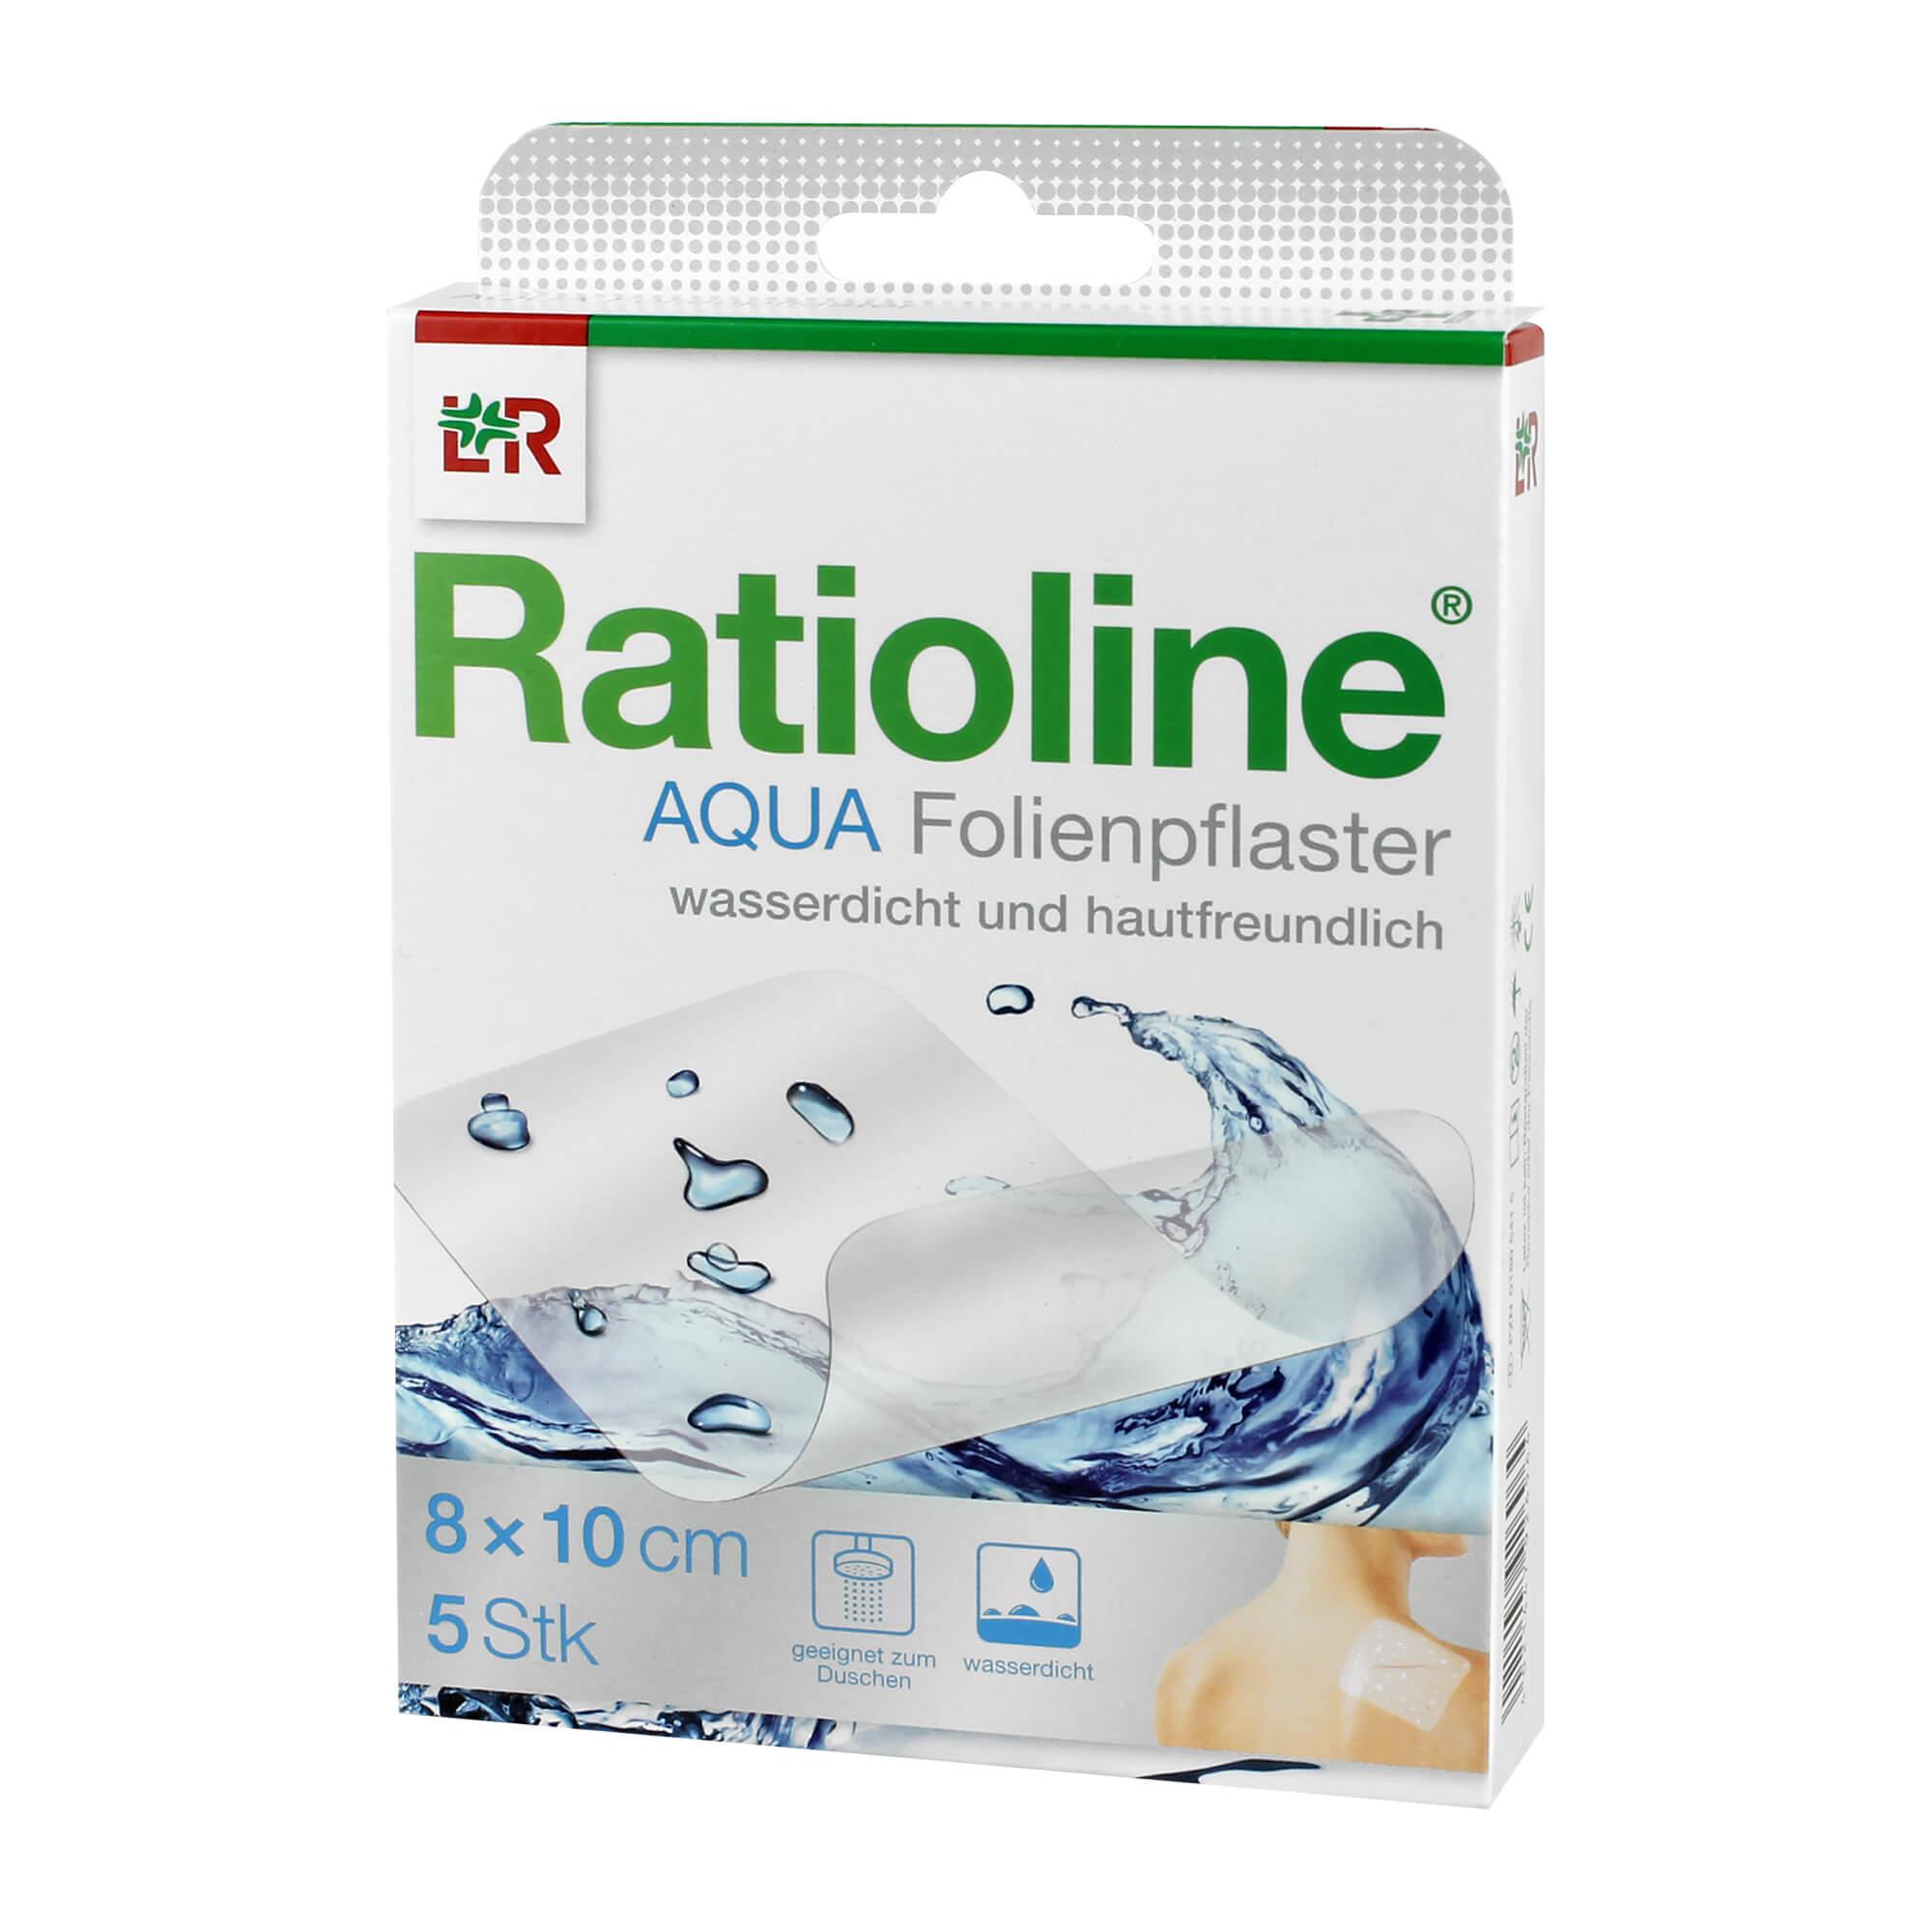 Ratioline aqua Duschpflaster 8x10 cm